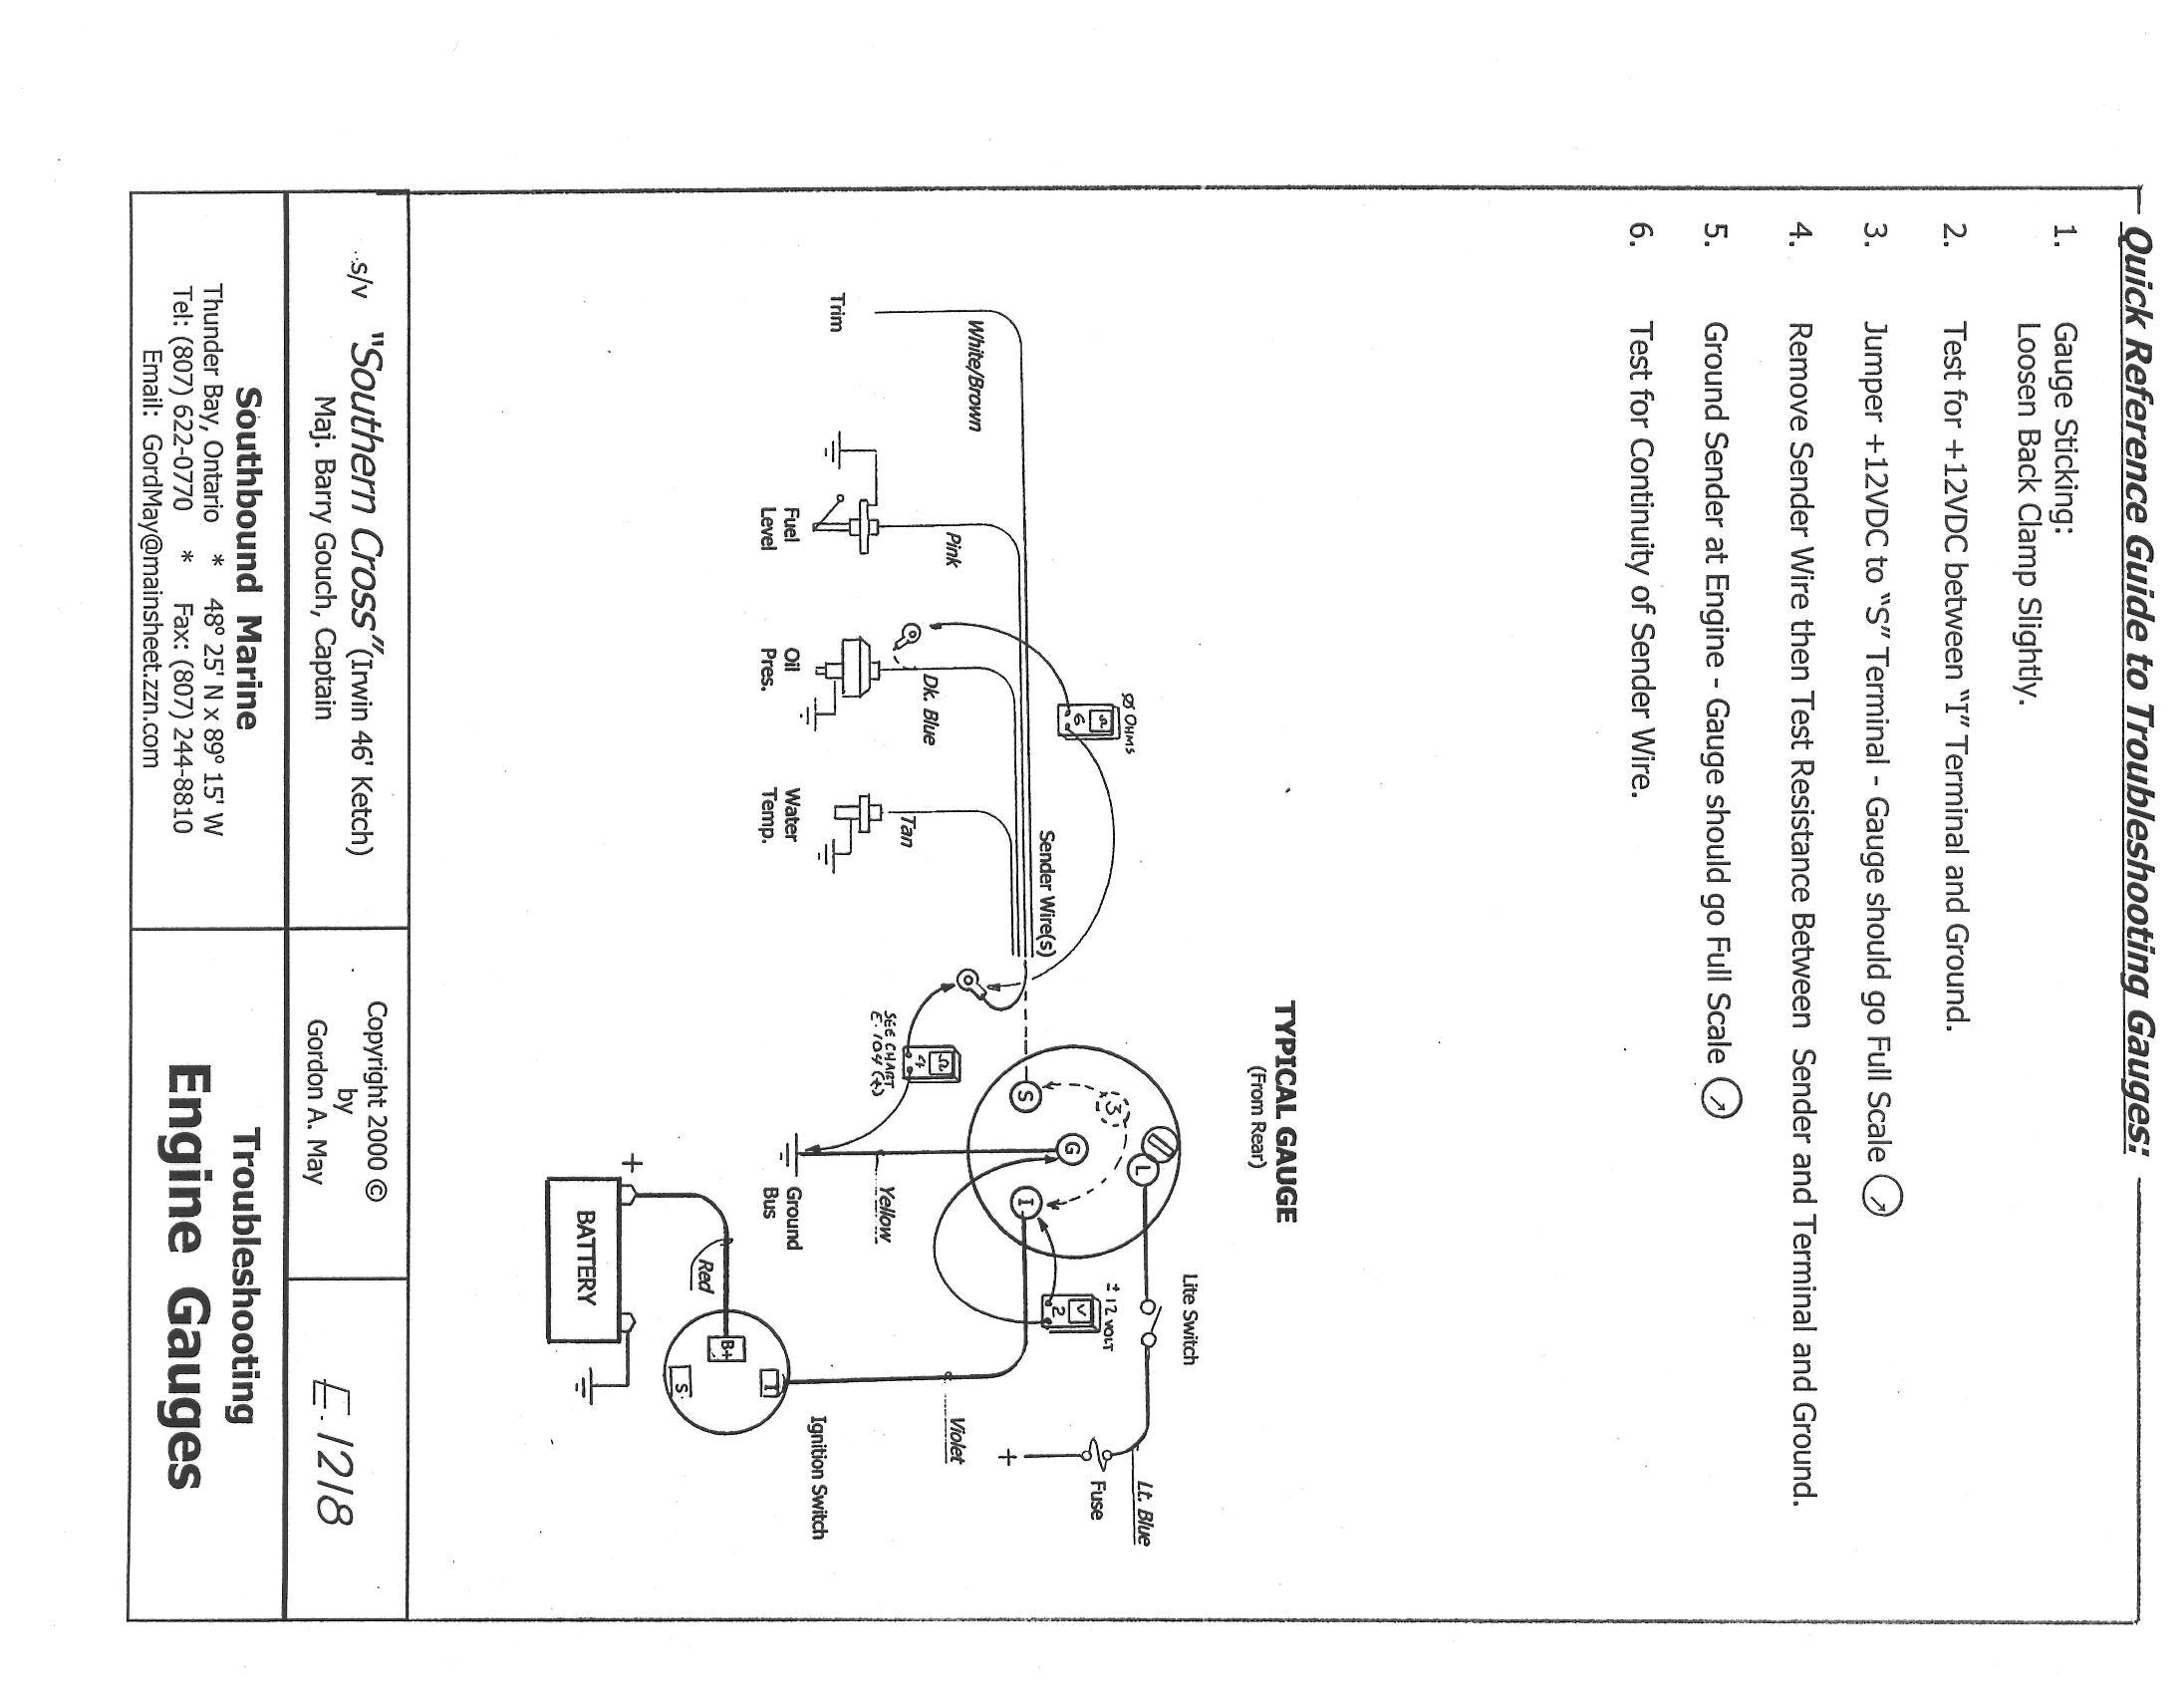 typical wiring diagram - engine gauges - engione gauges ... home a c wiring diagram #7